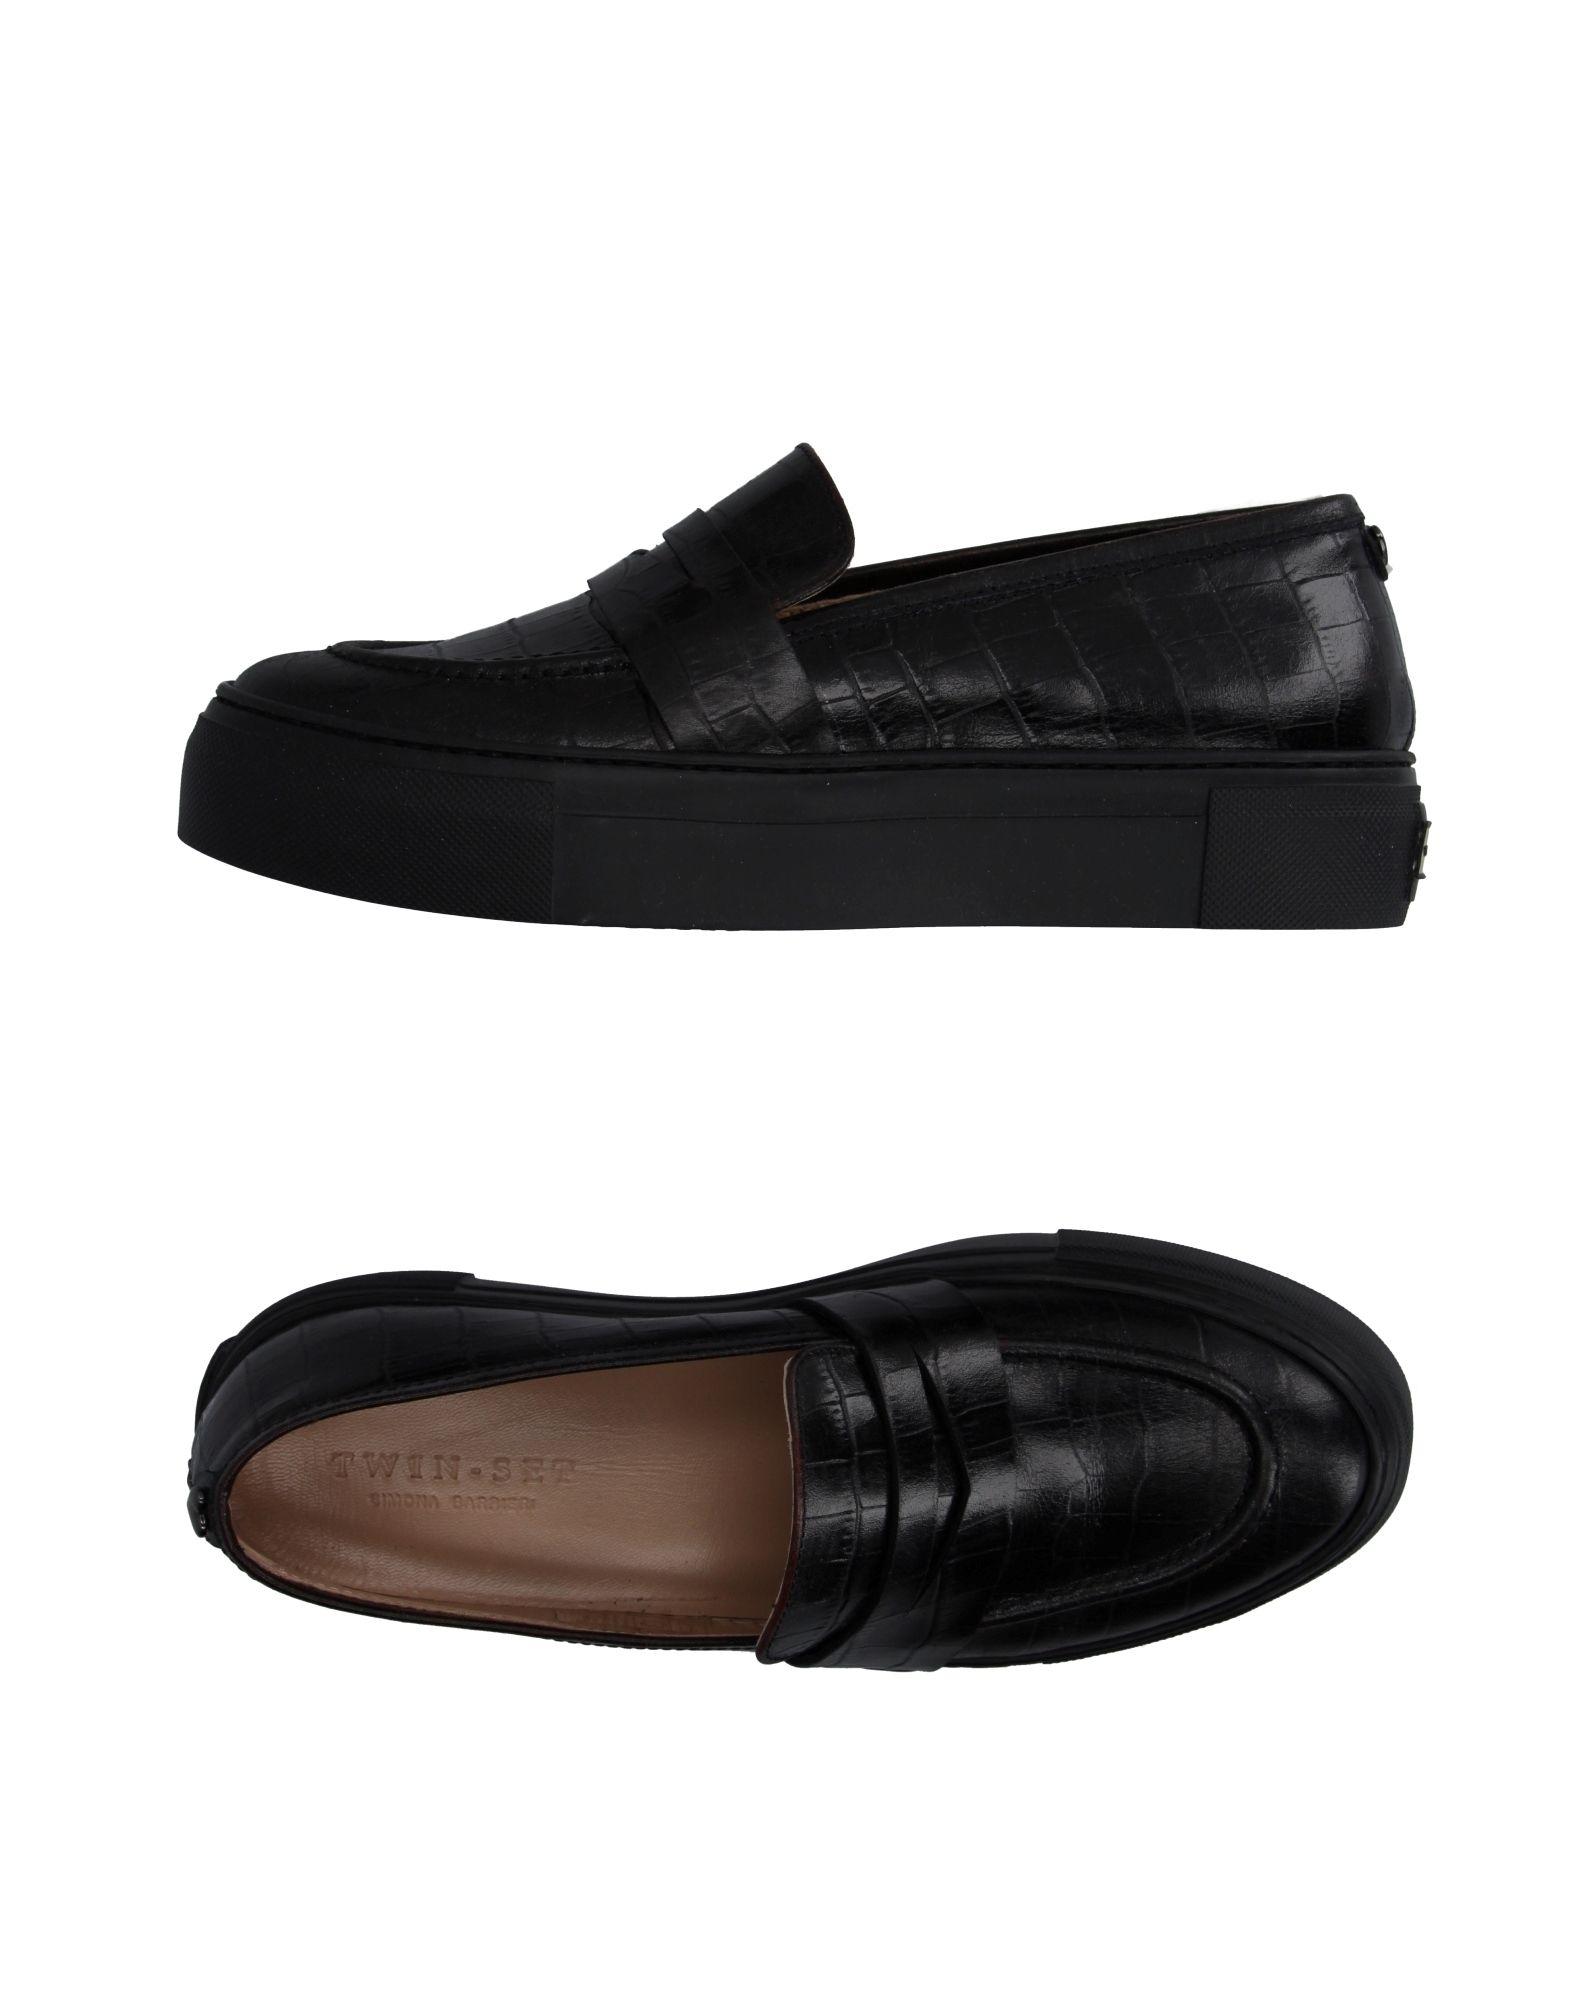 Haltbare Mode billige Schuhe Schuhe Twin 11058227EB Beliebte Schuhe billige ca8a0d